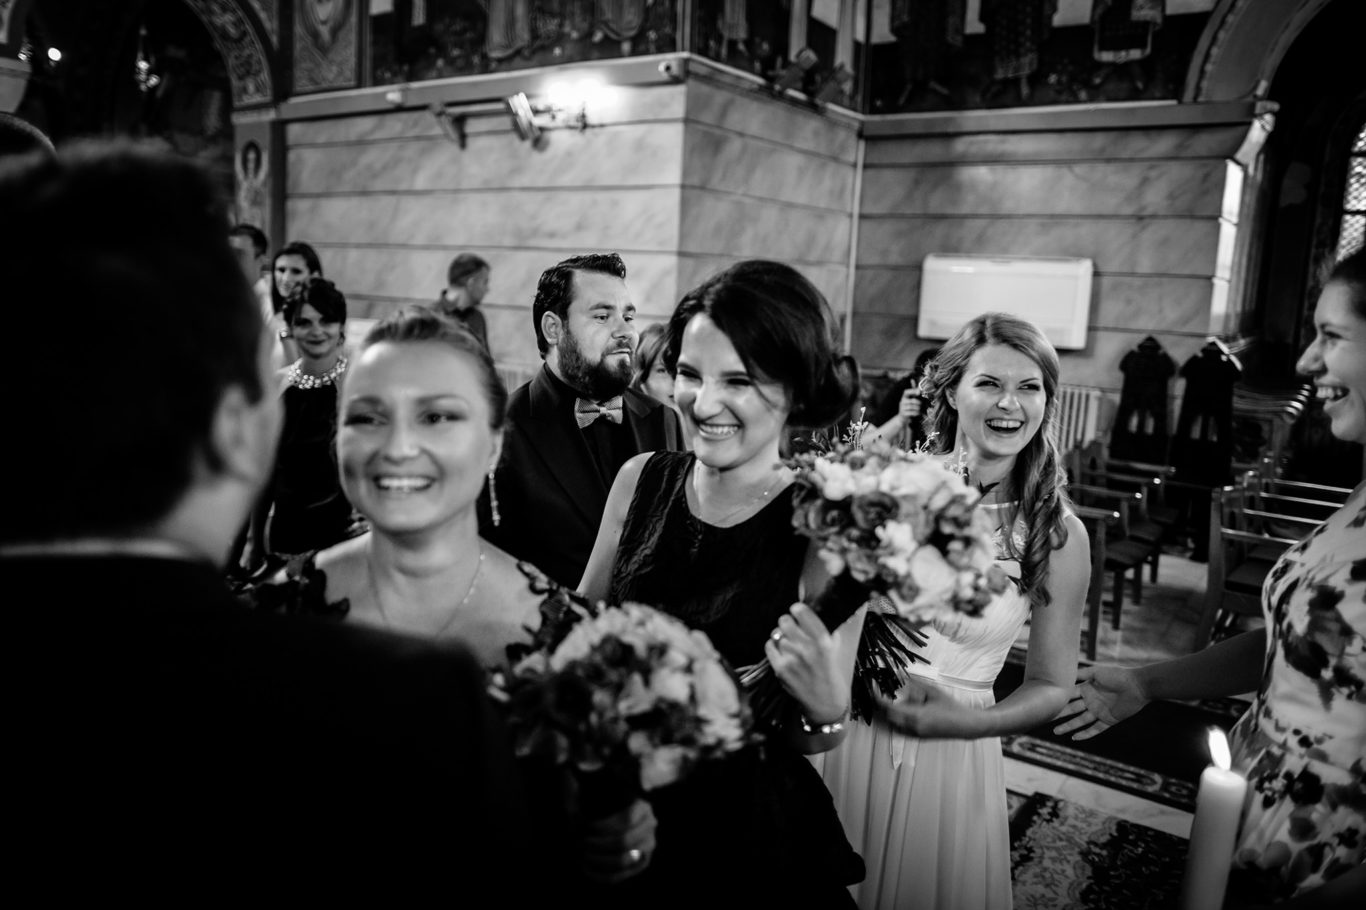 0450-fotografie-nunta-bucuresti-rodica-rares-fotograf-ciprian-dumitrescu-cd2_0019